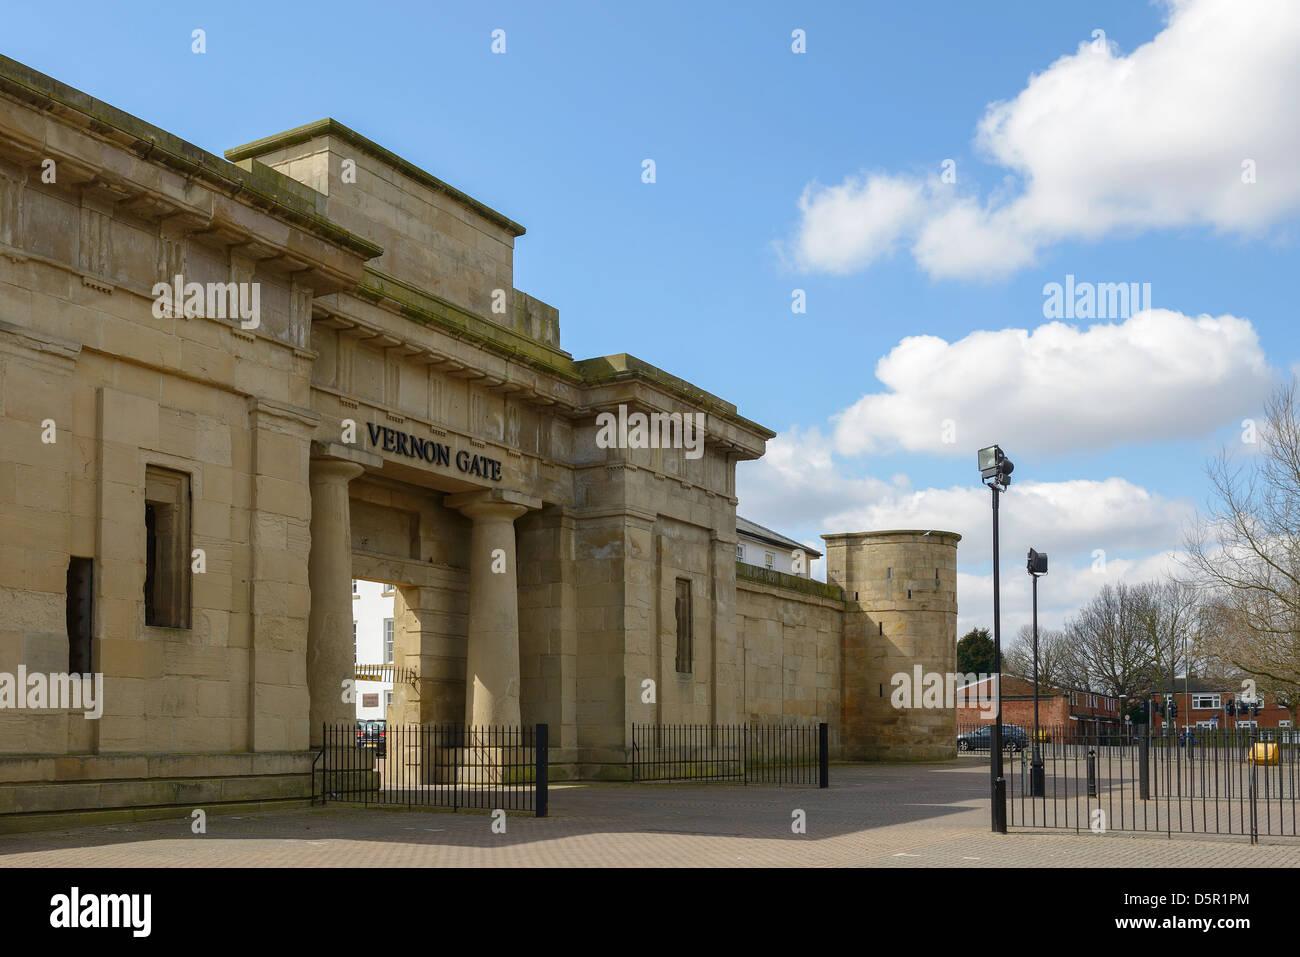 Vernon Gate Derby UK - Stock Image